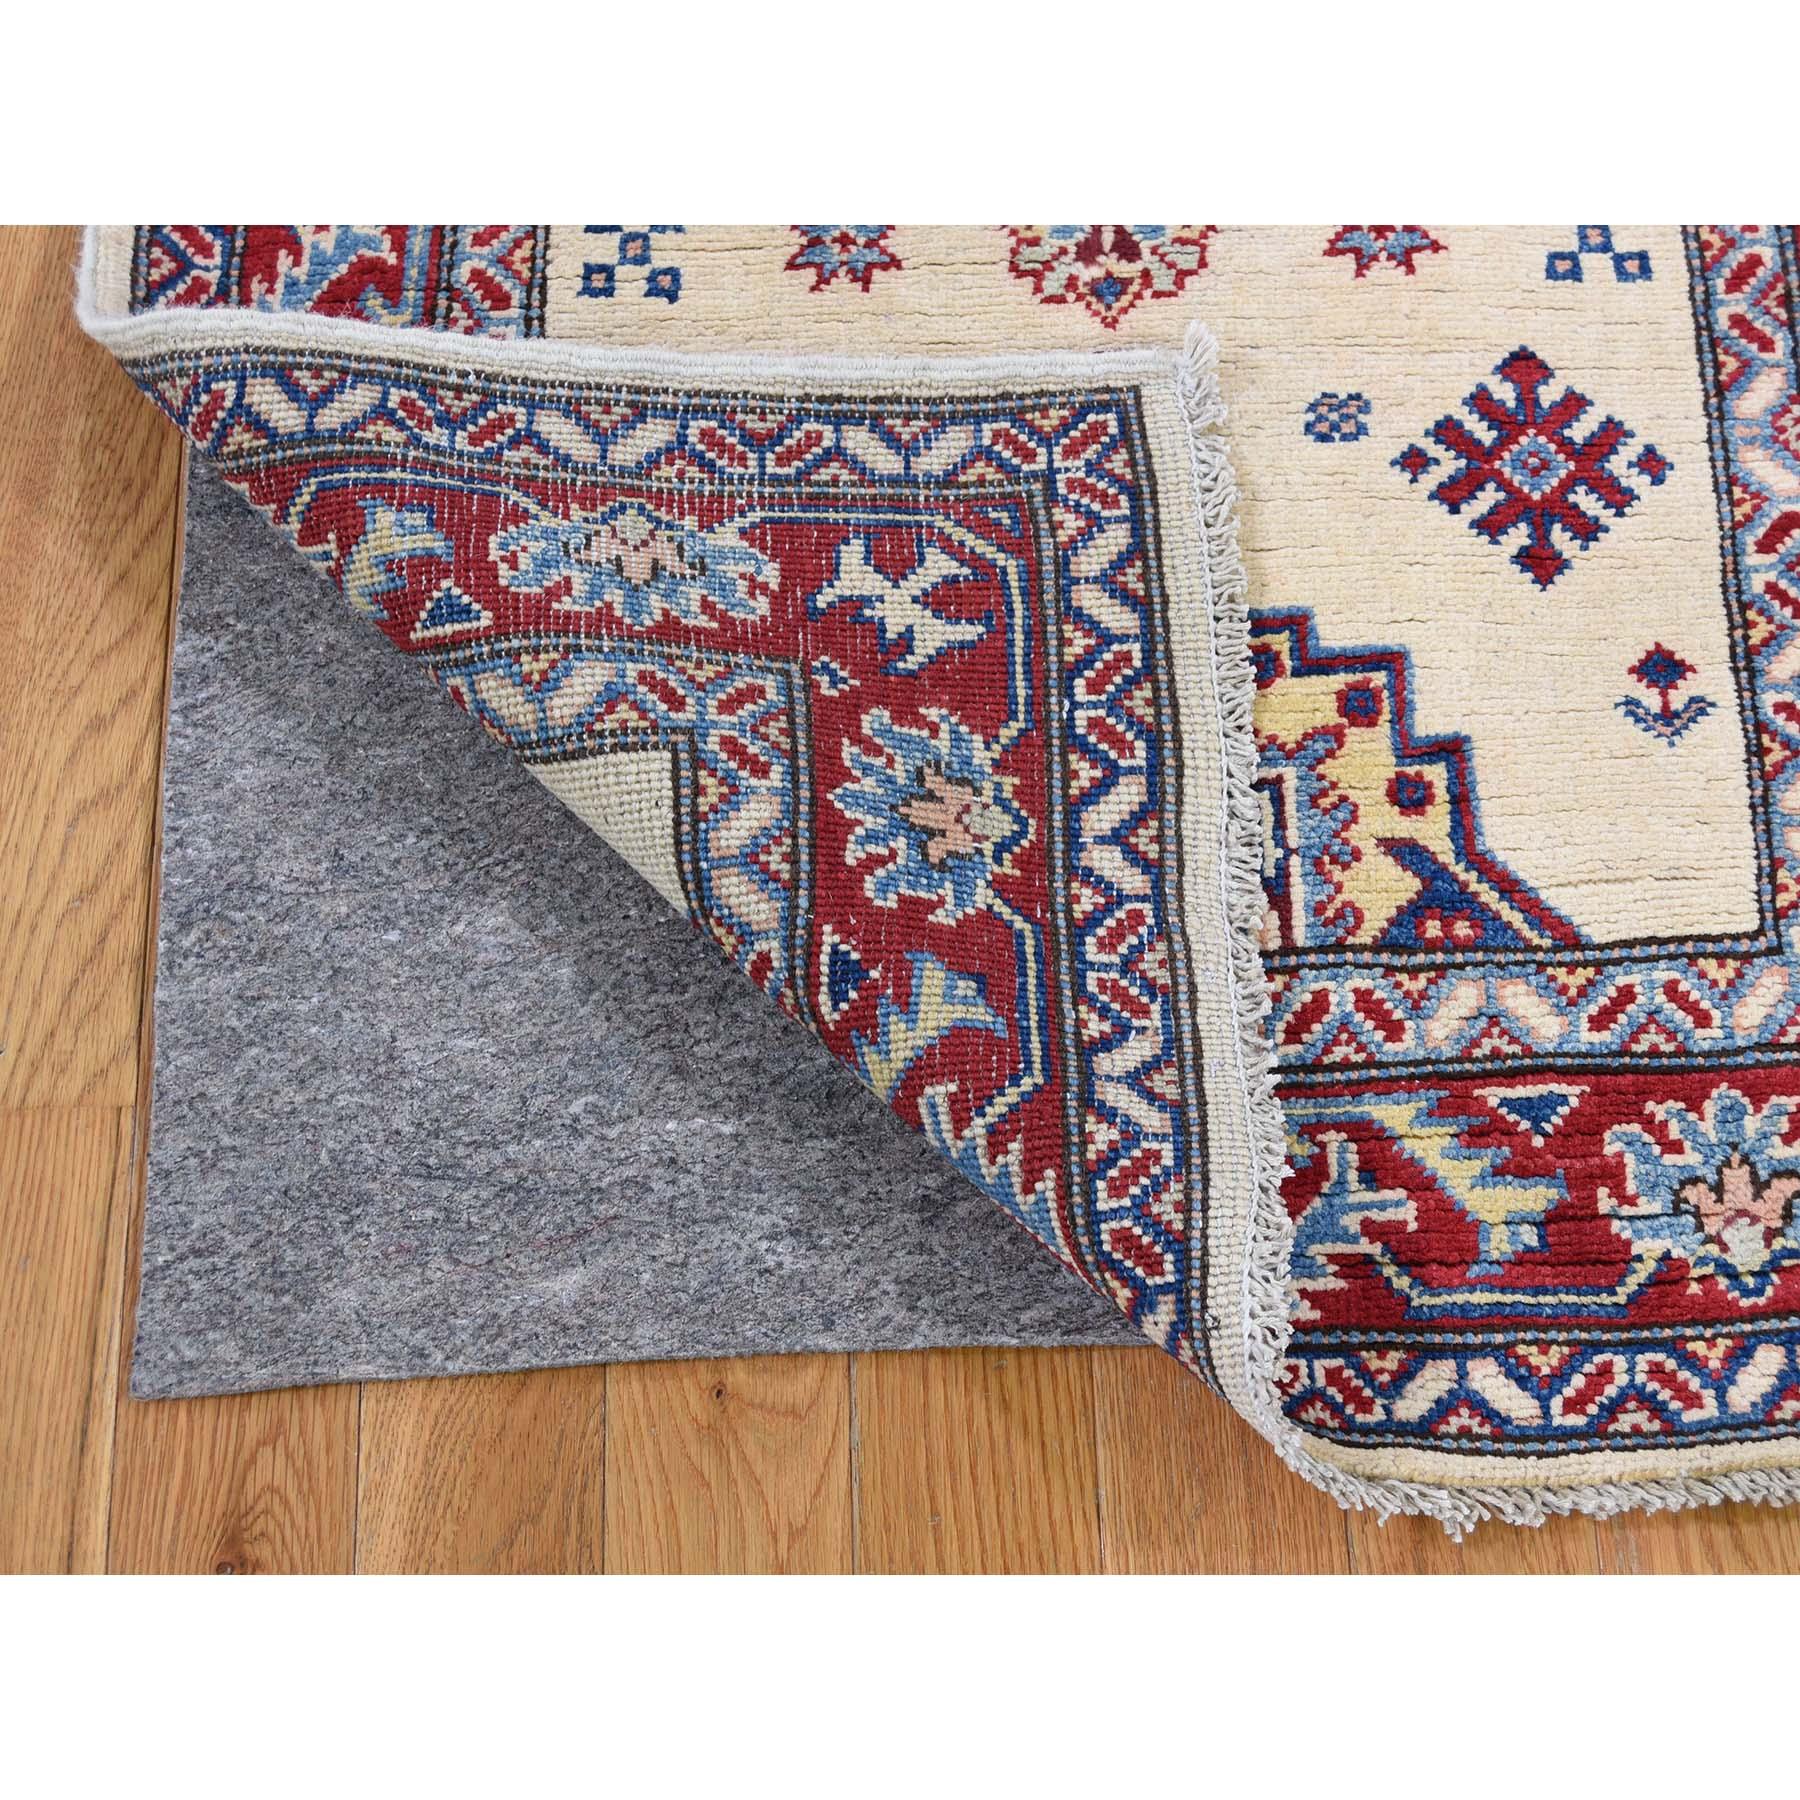 2 9 X9 Special Kazak Pure Wool Runner Hand Knotted Geometric Design Oriental Rug